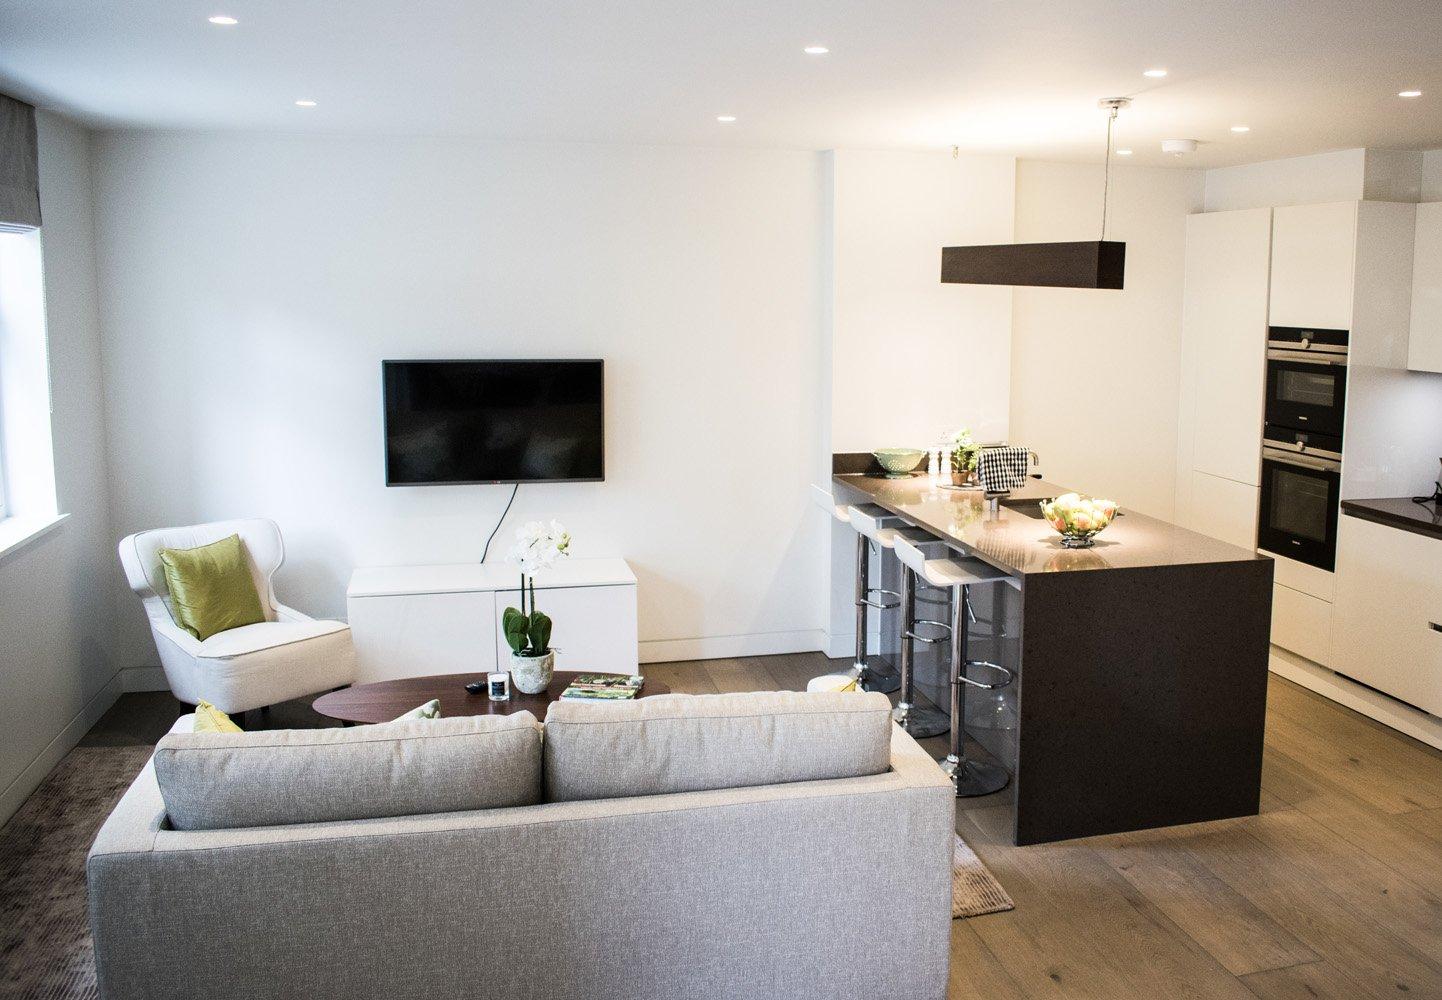 Marylebone-Luxury-Accommodation-Central-London-Serviced-Apartments-Near-Oxford-Street,-Bond-Street-&-Hyde-Park-Urban-Stay-9